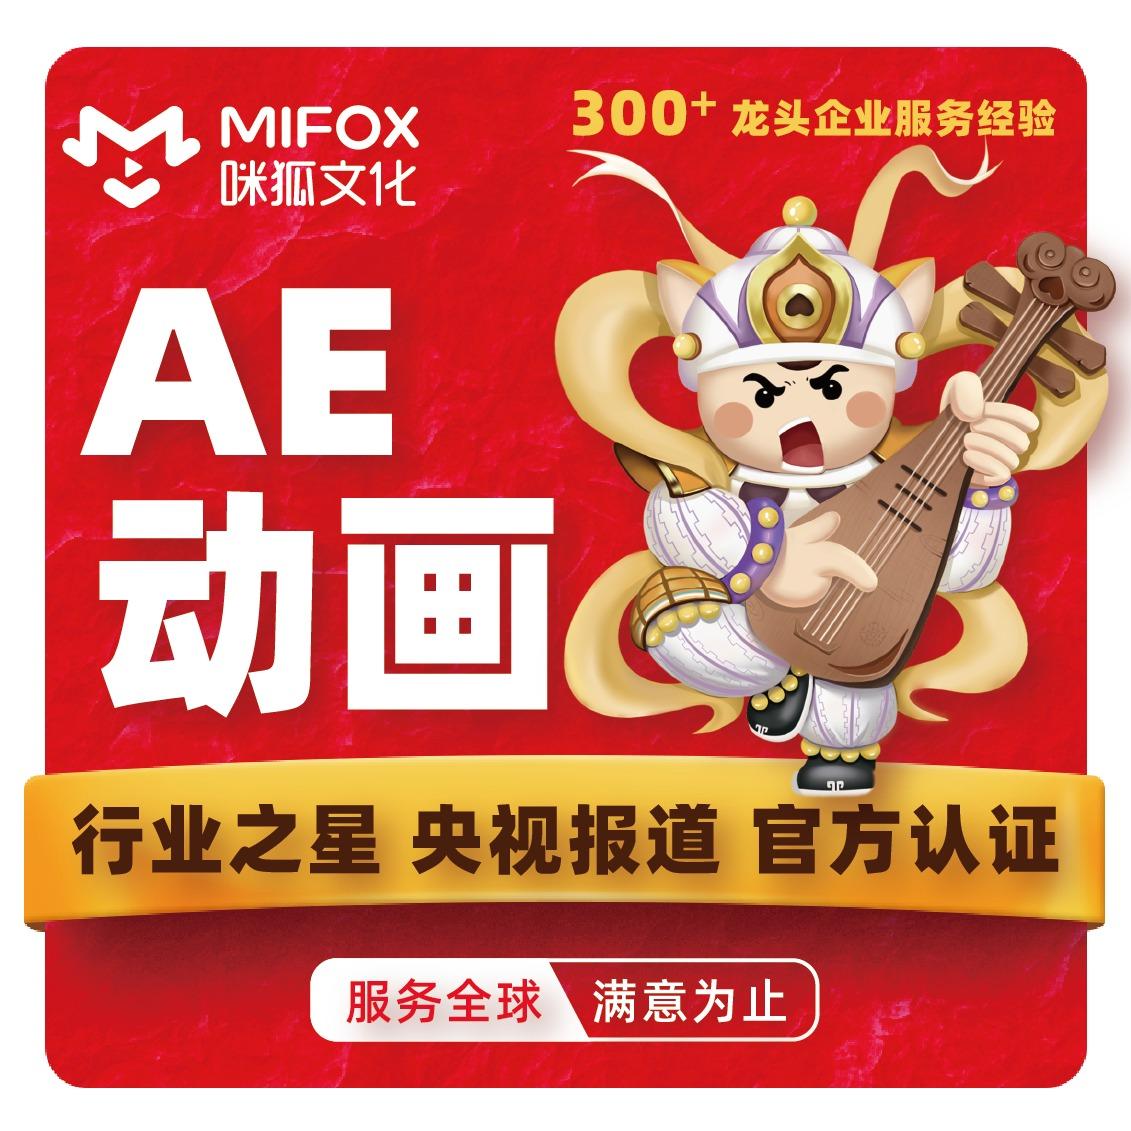 【AE动画】MG动画二维mg动画壹读飞碟说flash动画制作